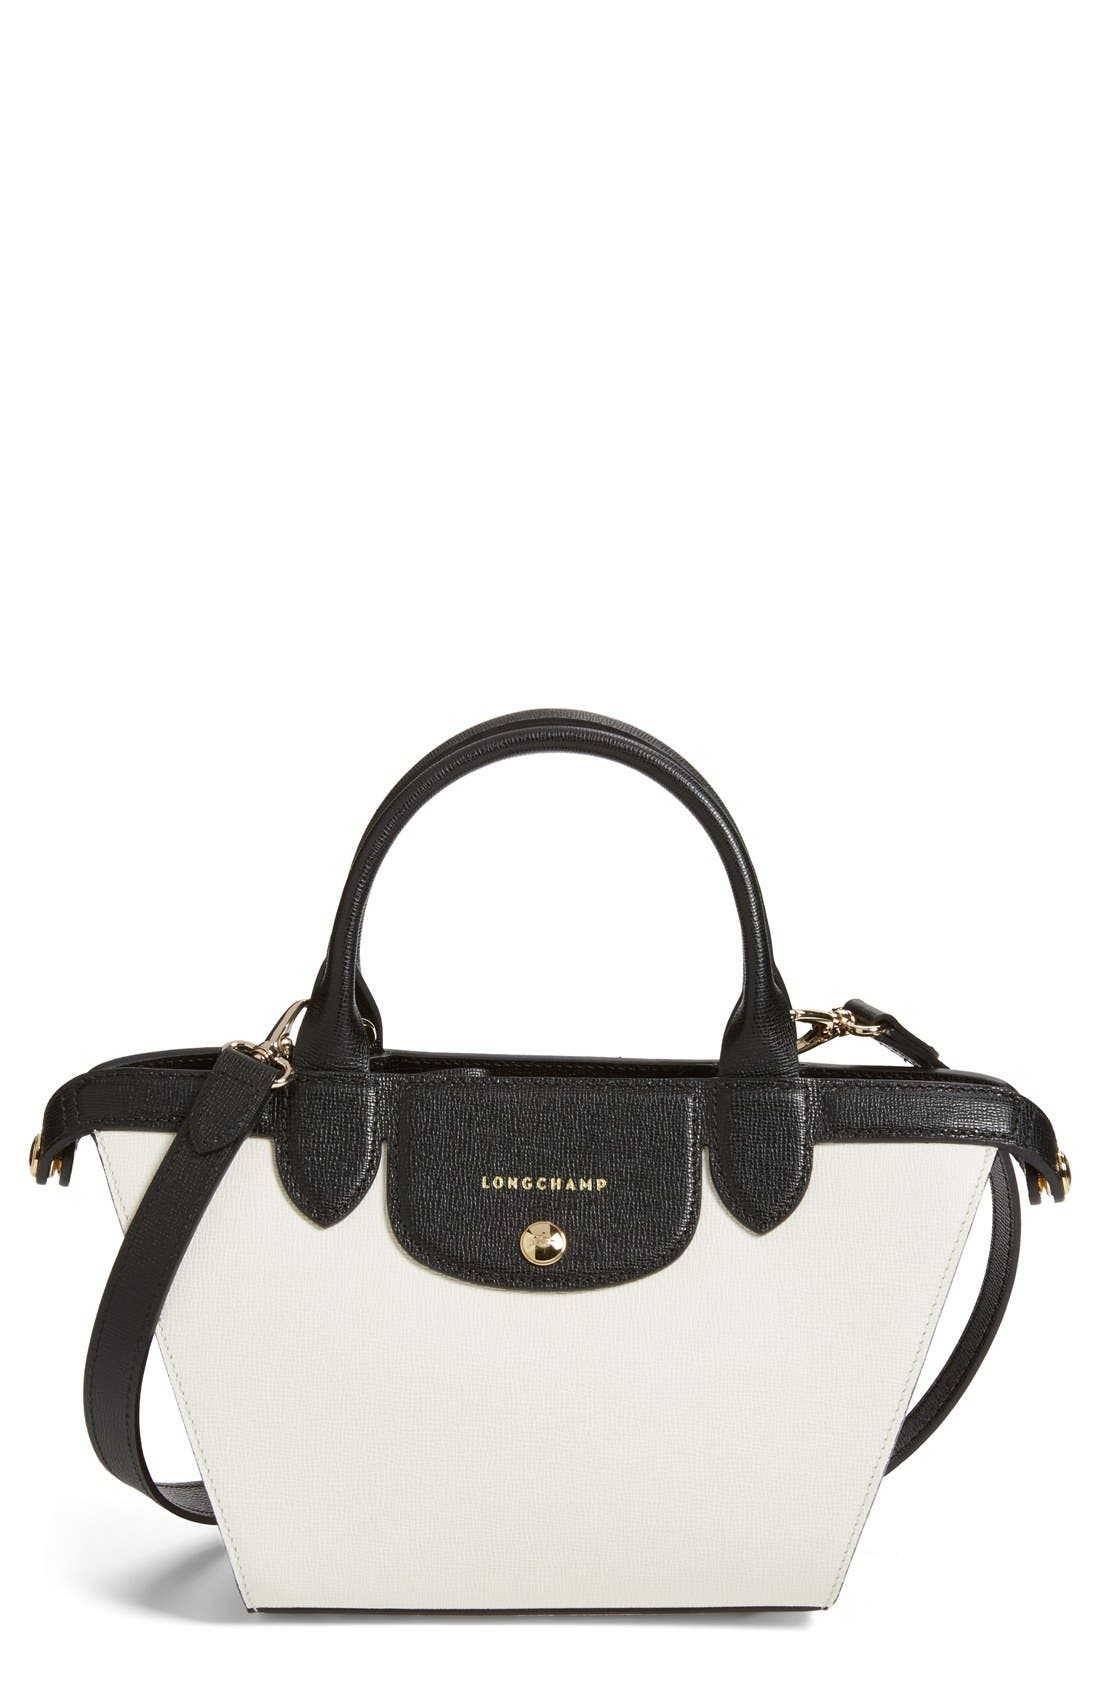 LONGCHAMP 'Small Le Pliage - Heritage' Leather Handbag, Main, color, 100